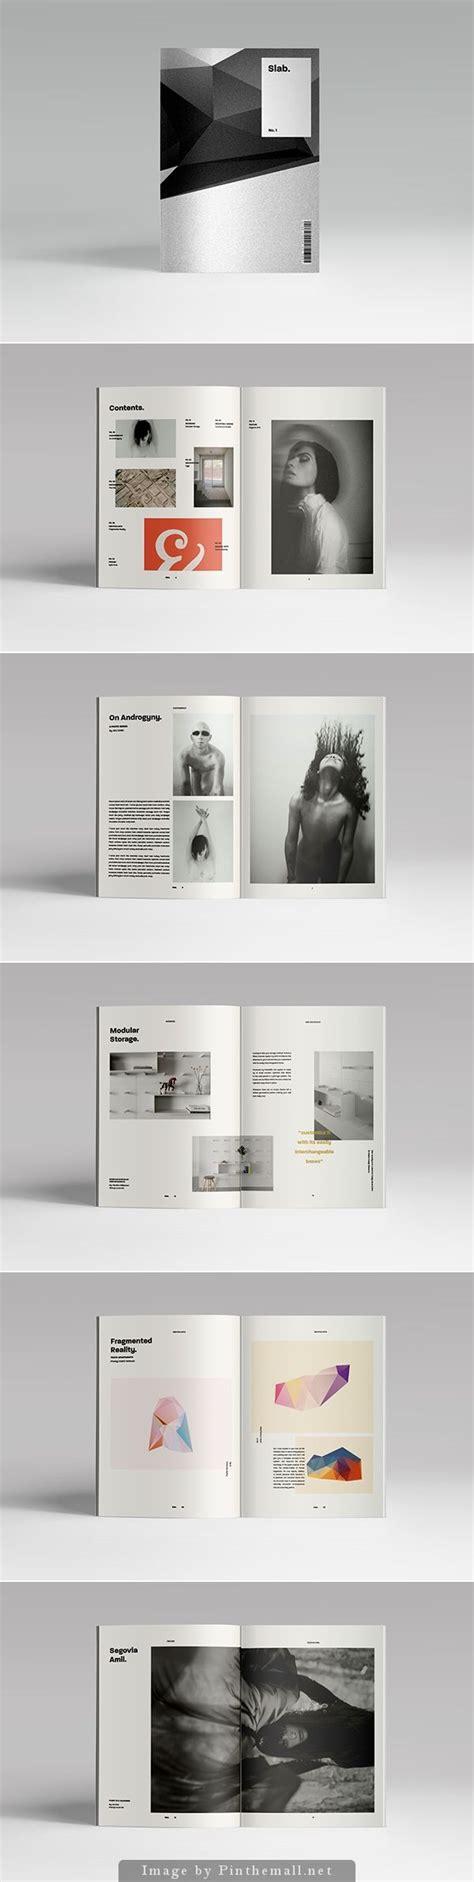 ebook interior design design book ebook interior or layout 편집 디자인 레이아웃 및 책